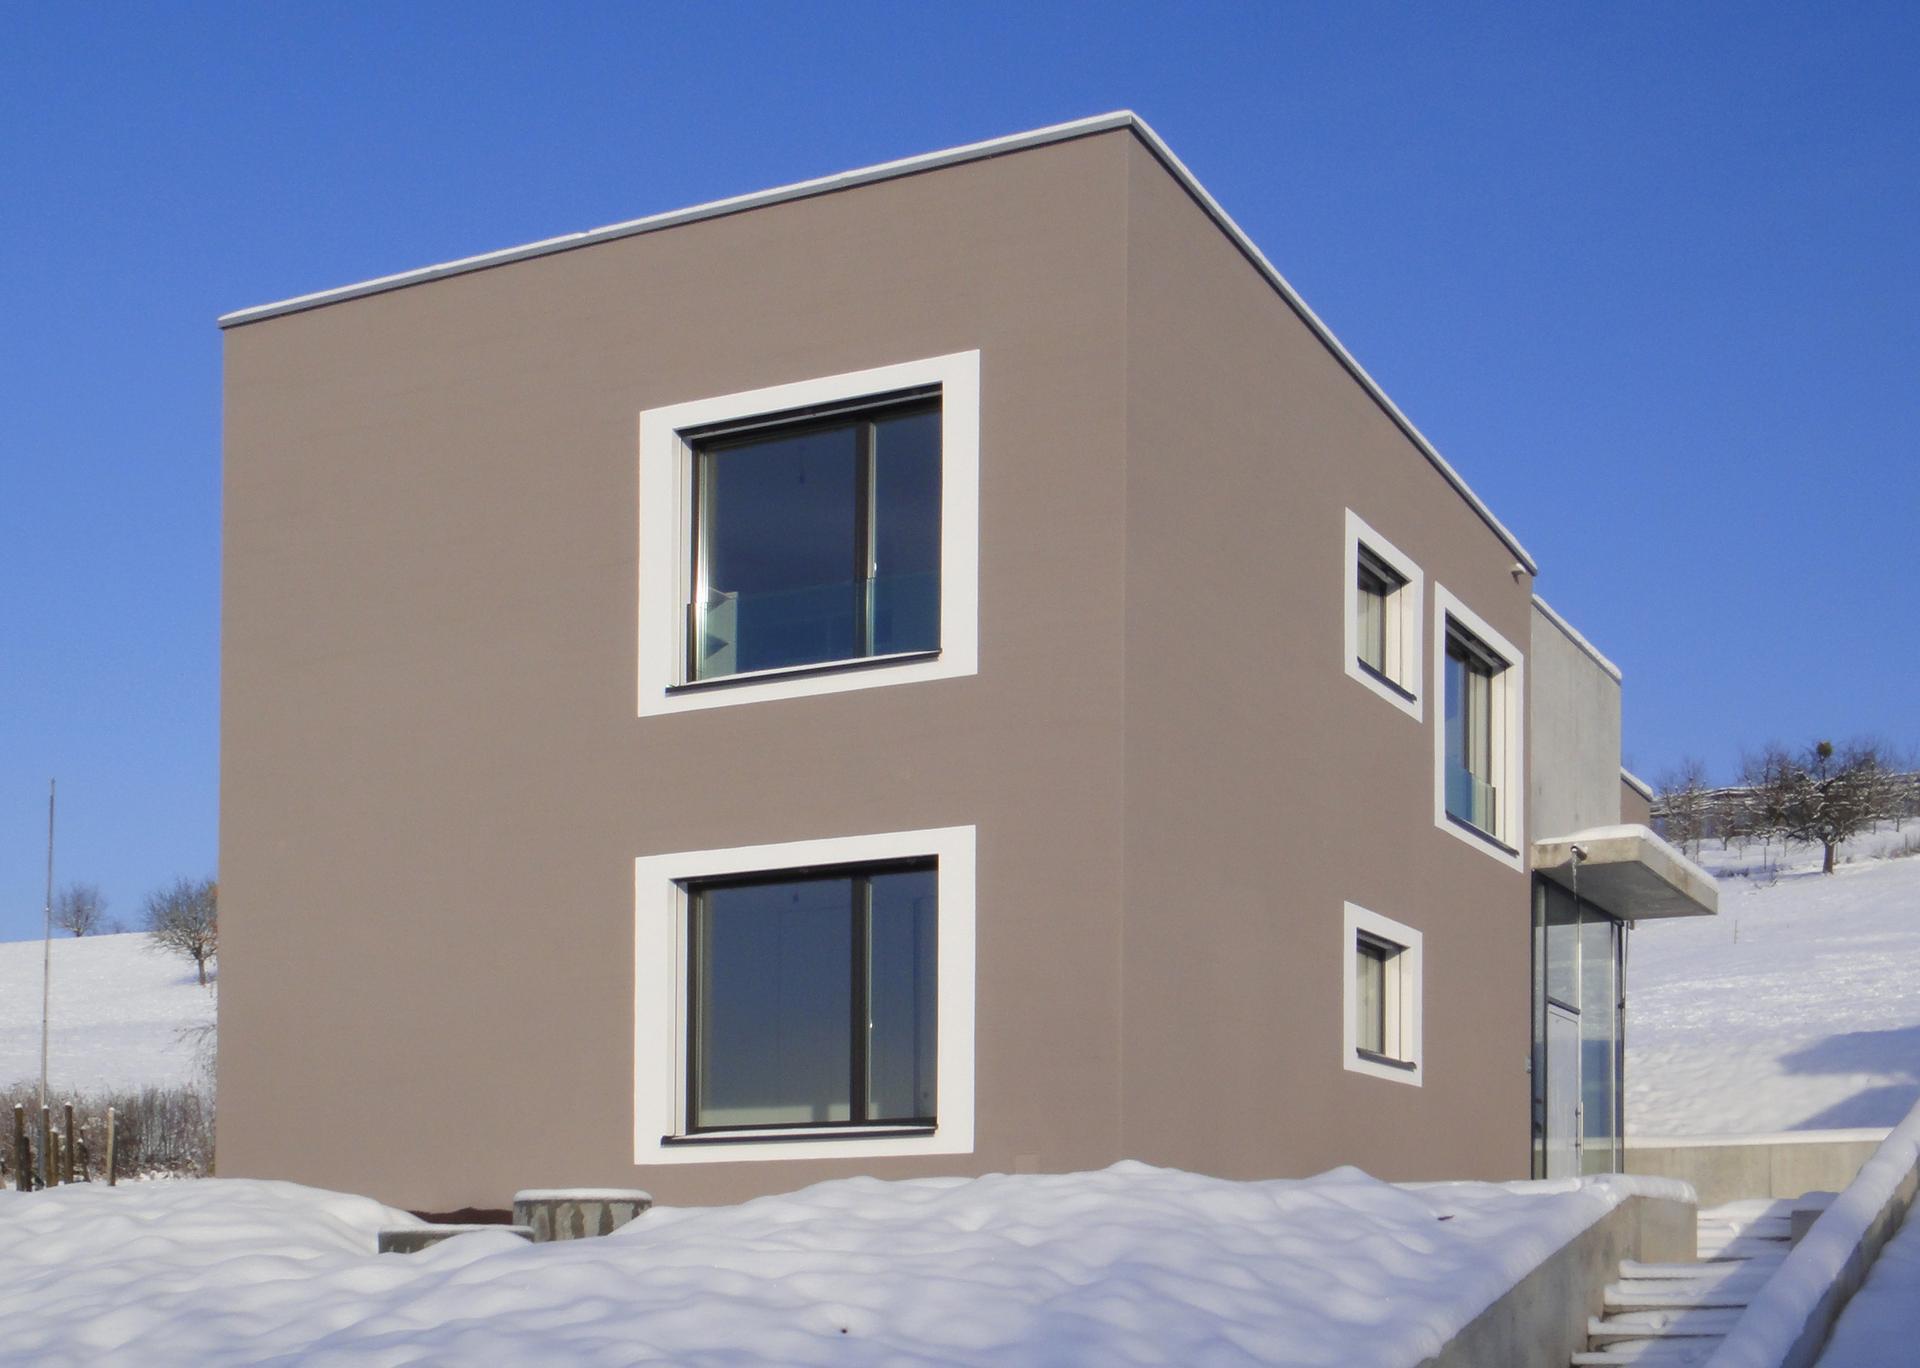 Efh r bmatt olsberg bfb architekten ag for Architekten schweiz